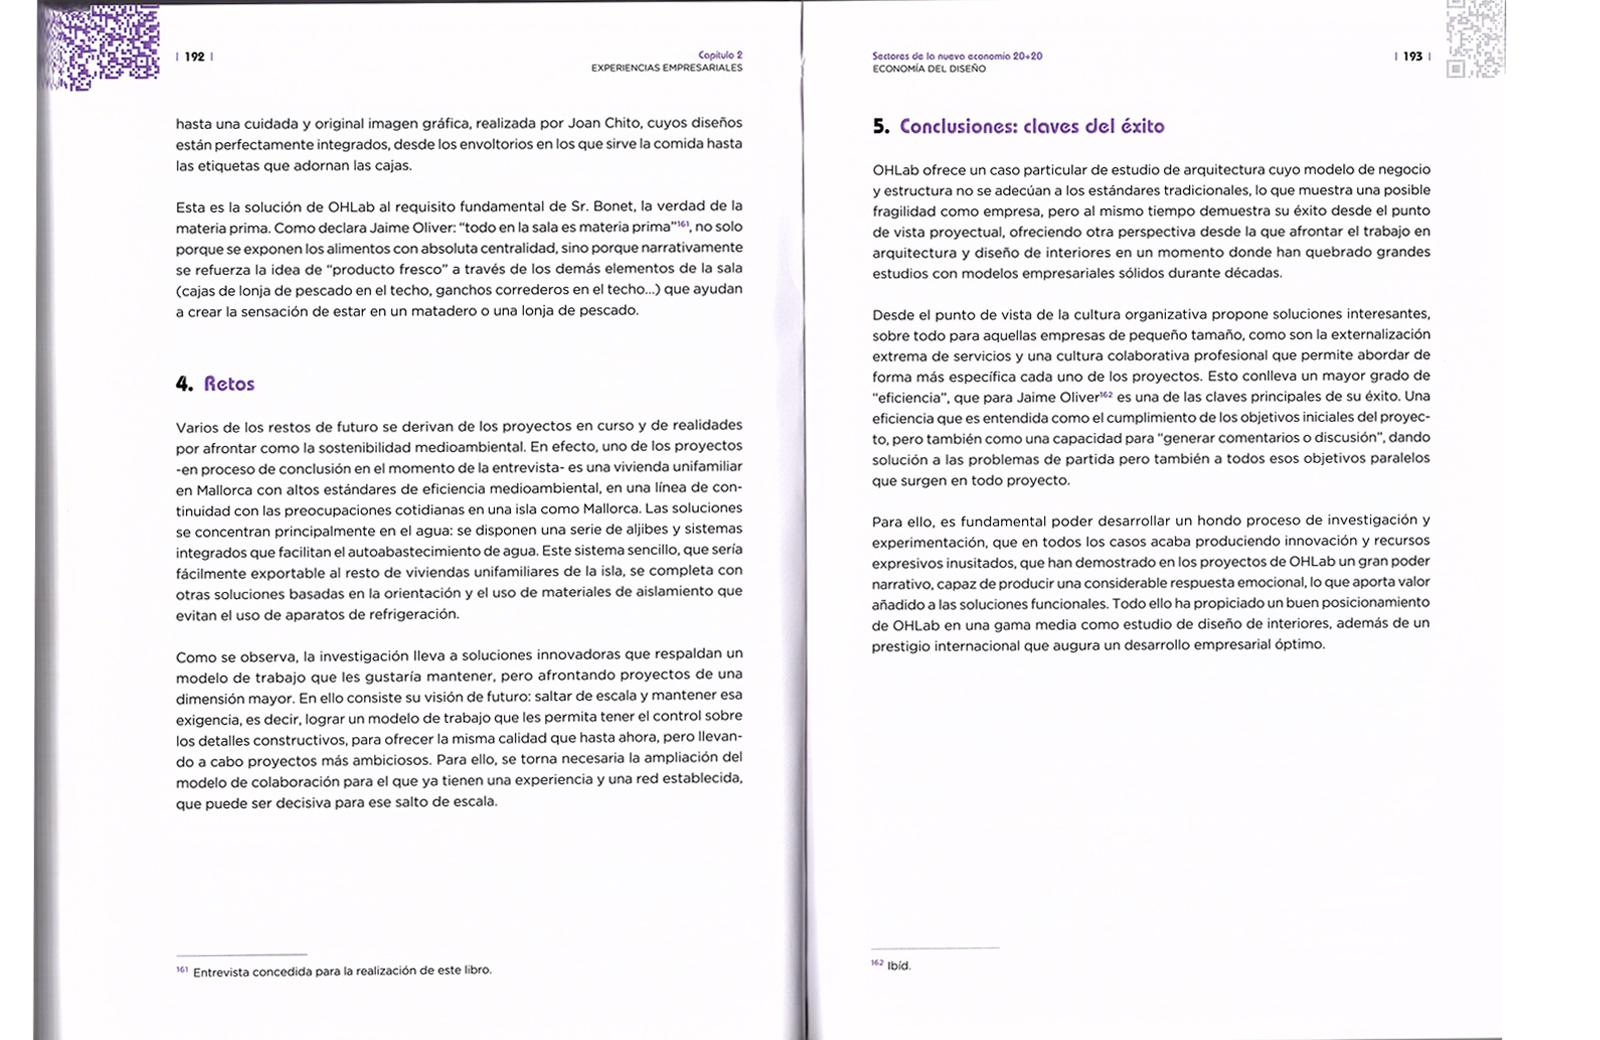 nueva-economia-2020-89